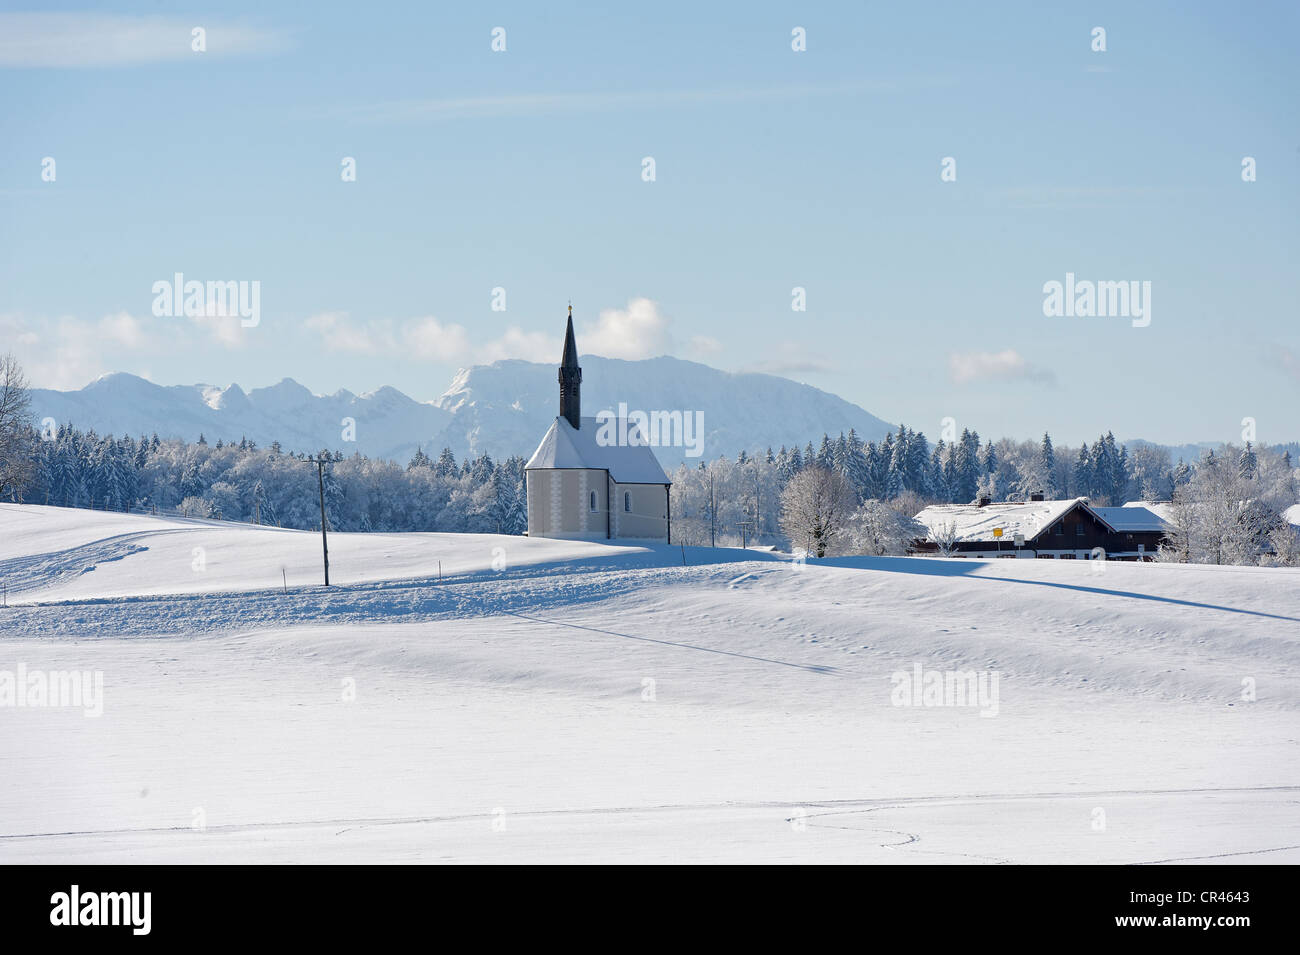 St. Sebastian daughter church, Kleinhartpenning, Mount Benediktenwand at back, Holzkirchen, Upper Bavaria, Bavaria - Stock Image